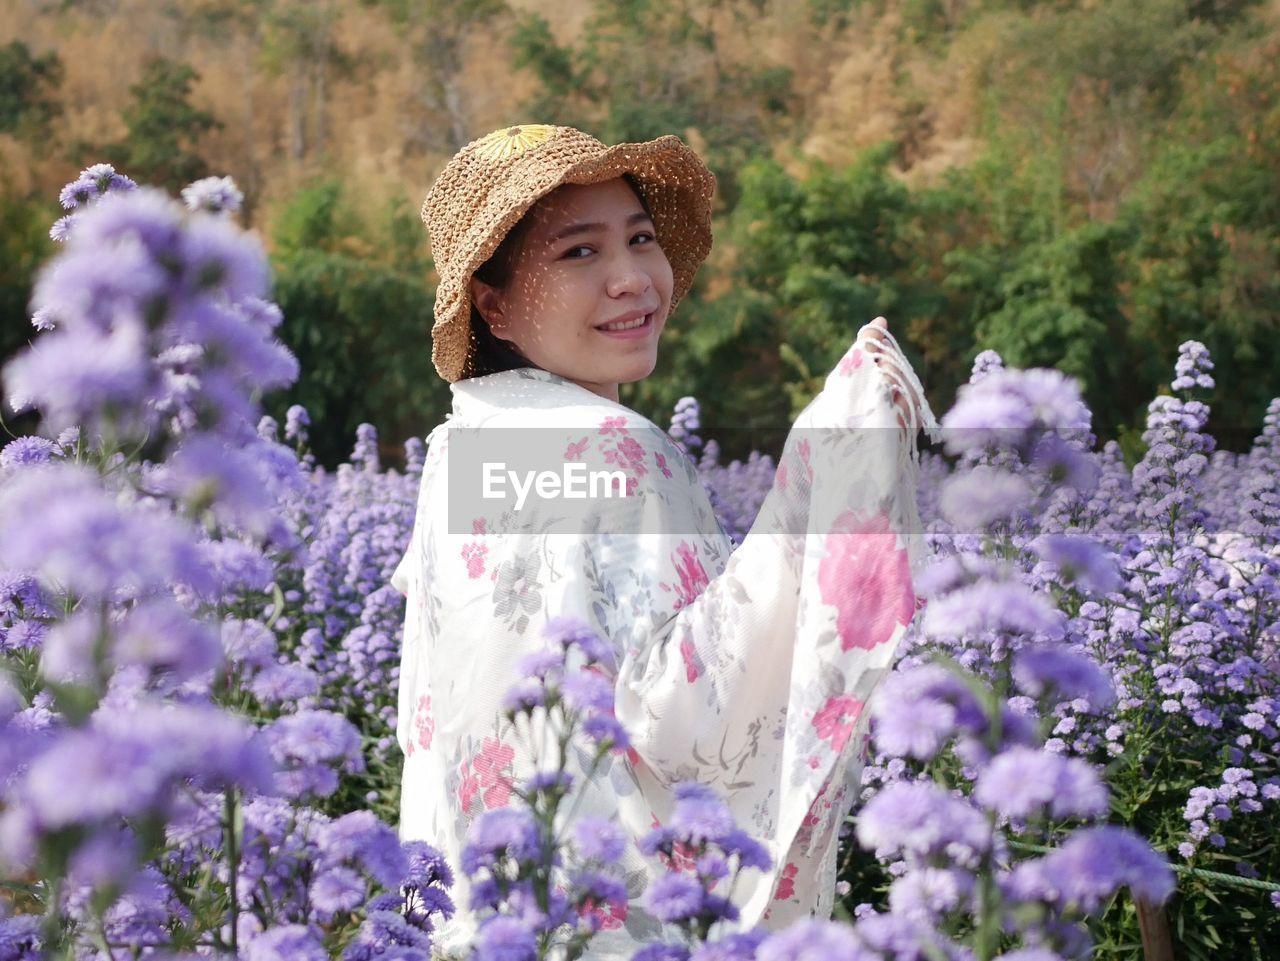 WOMAN STANDING ON PURPLE FLOWERING PLANT